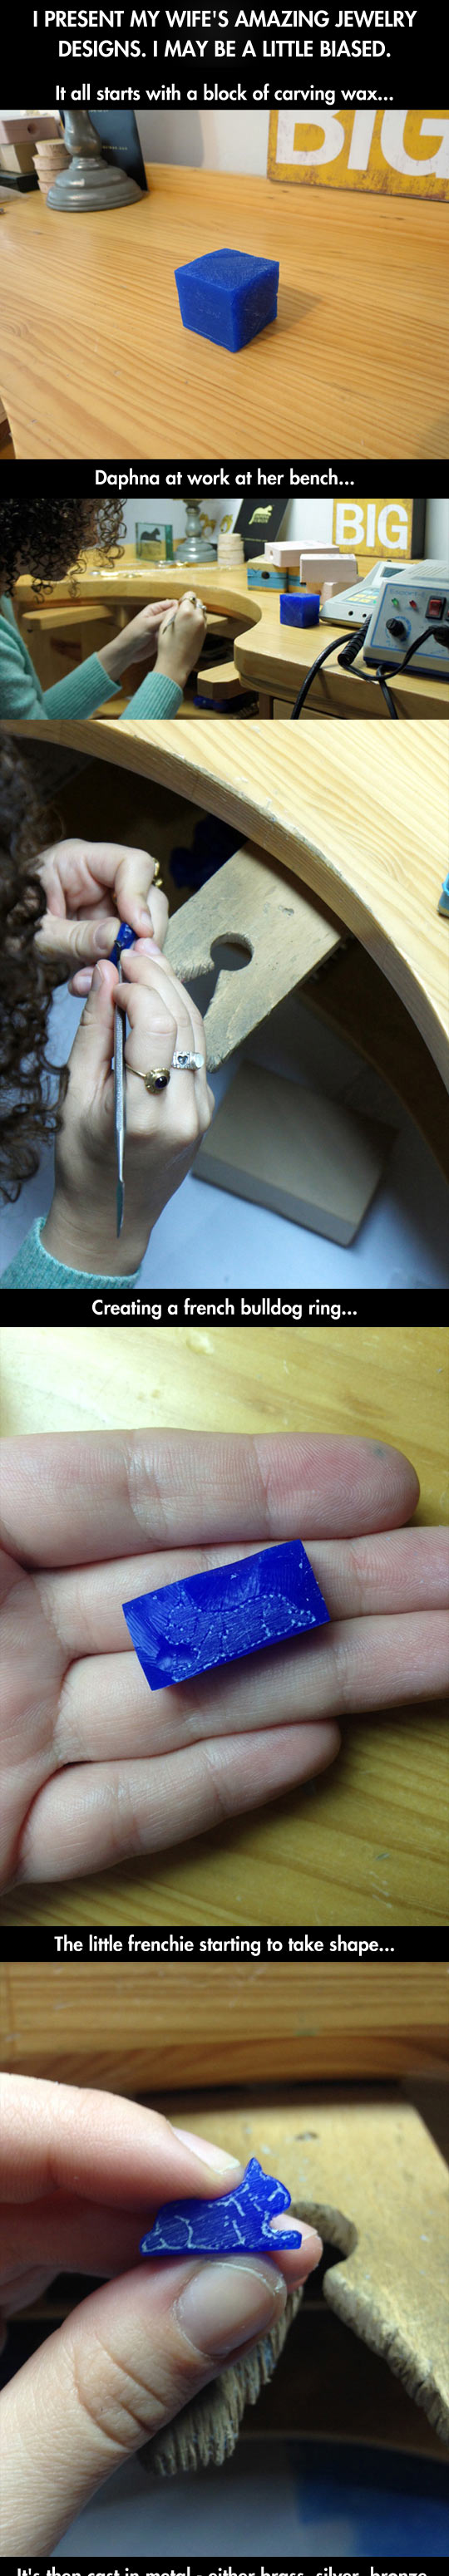 funny-wax-box-jewelry-rings